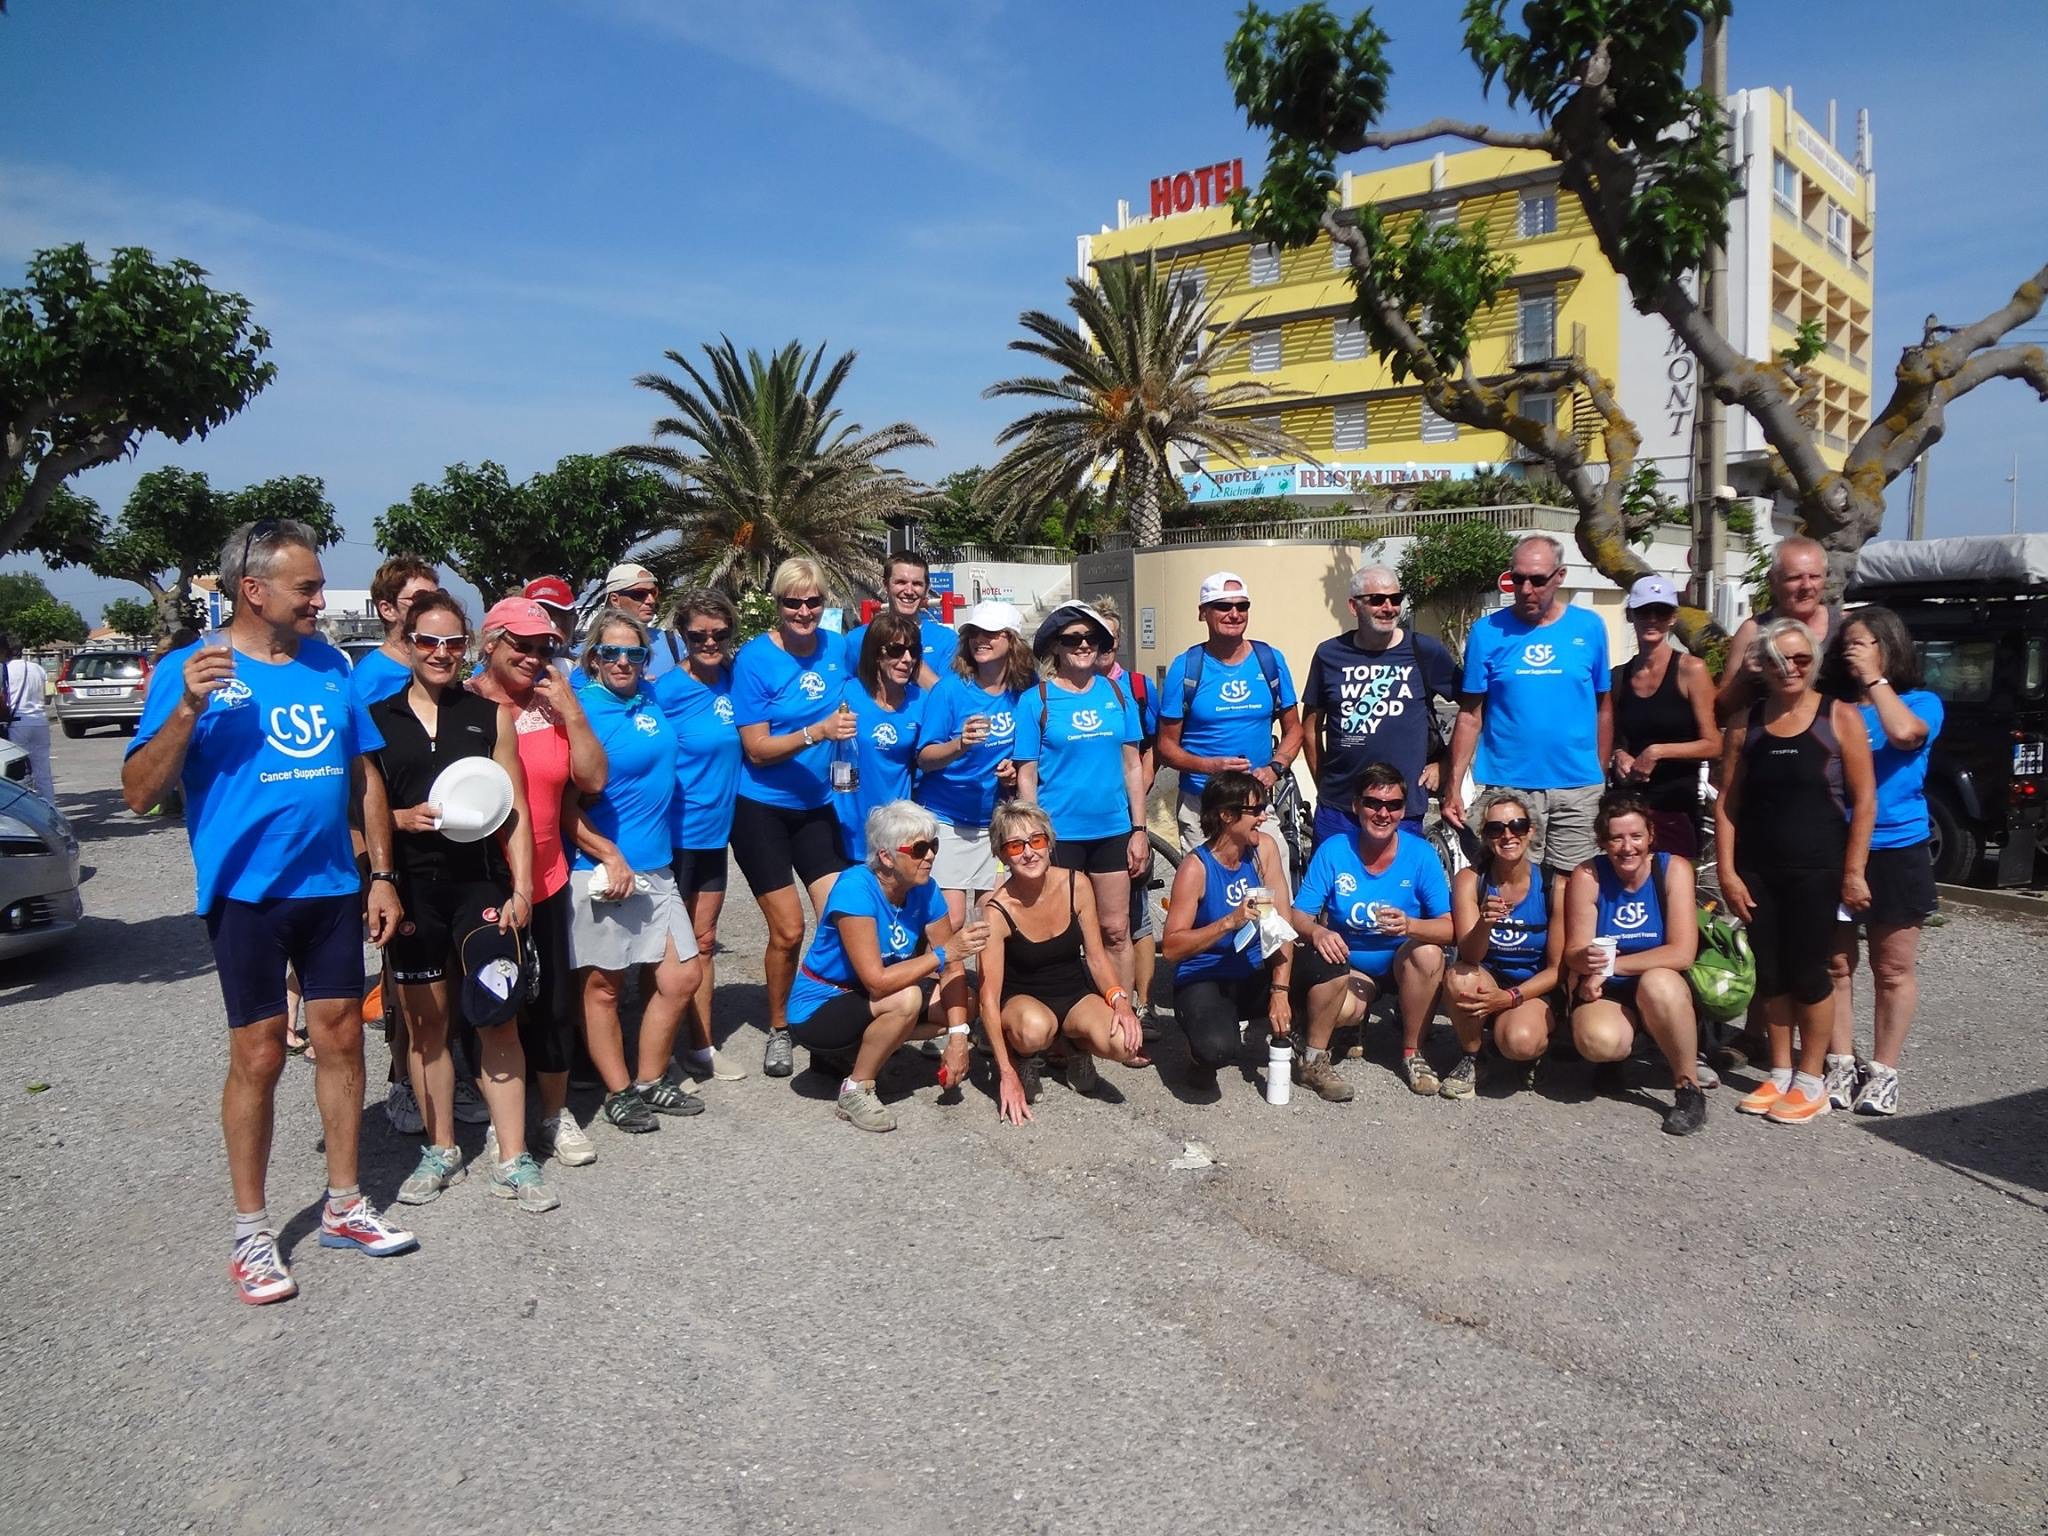 CSF - Canal de Garonne Charity Bike Ride 2016